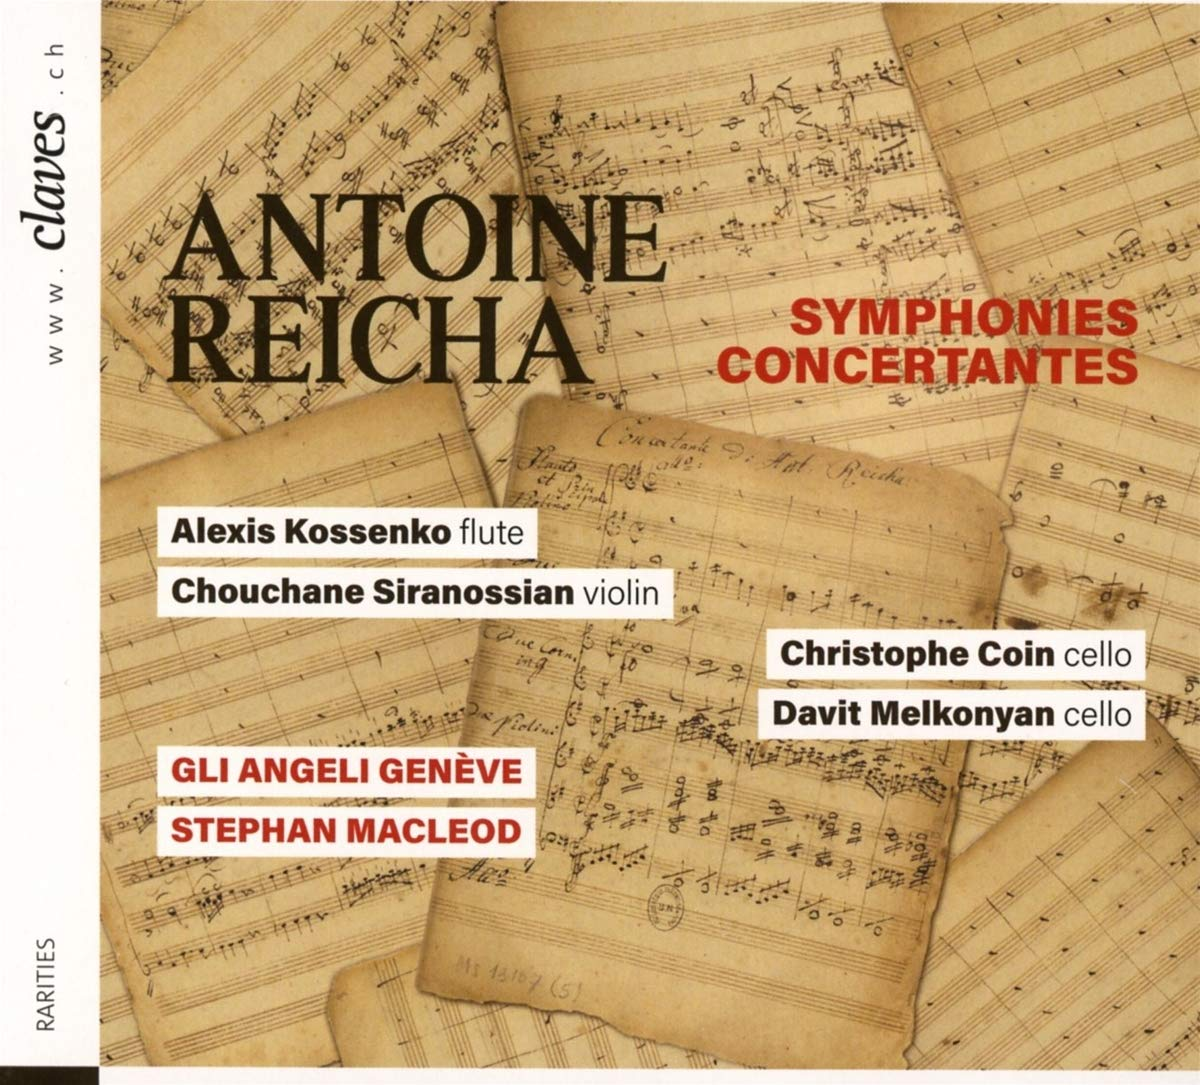 Antoine Reicha (Anton Rejcha) 1770-1836 - Page 3 71hH9IGiunL._SL1200_